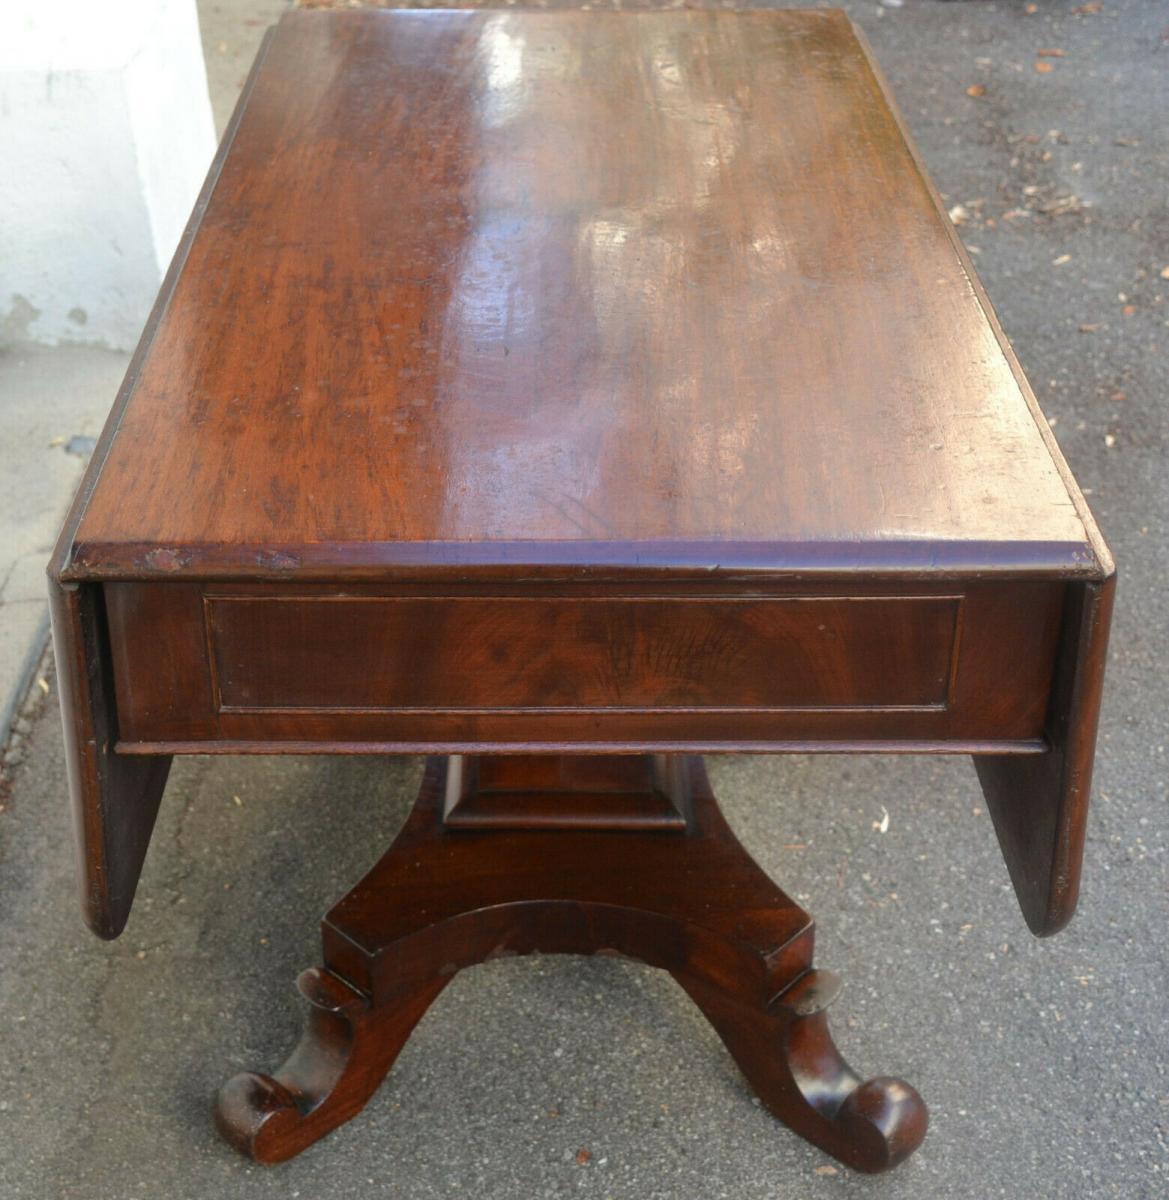 Mobiliar,Tisch,Georgian Drop Leaf Table,Mahagoni,um 1800, 3